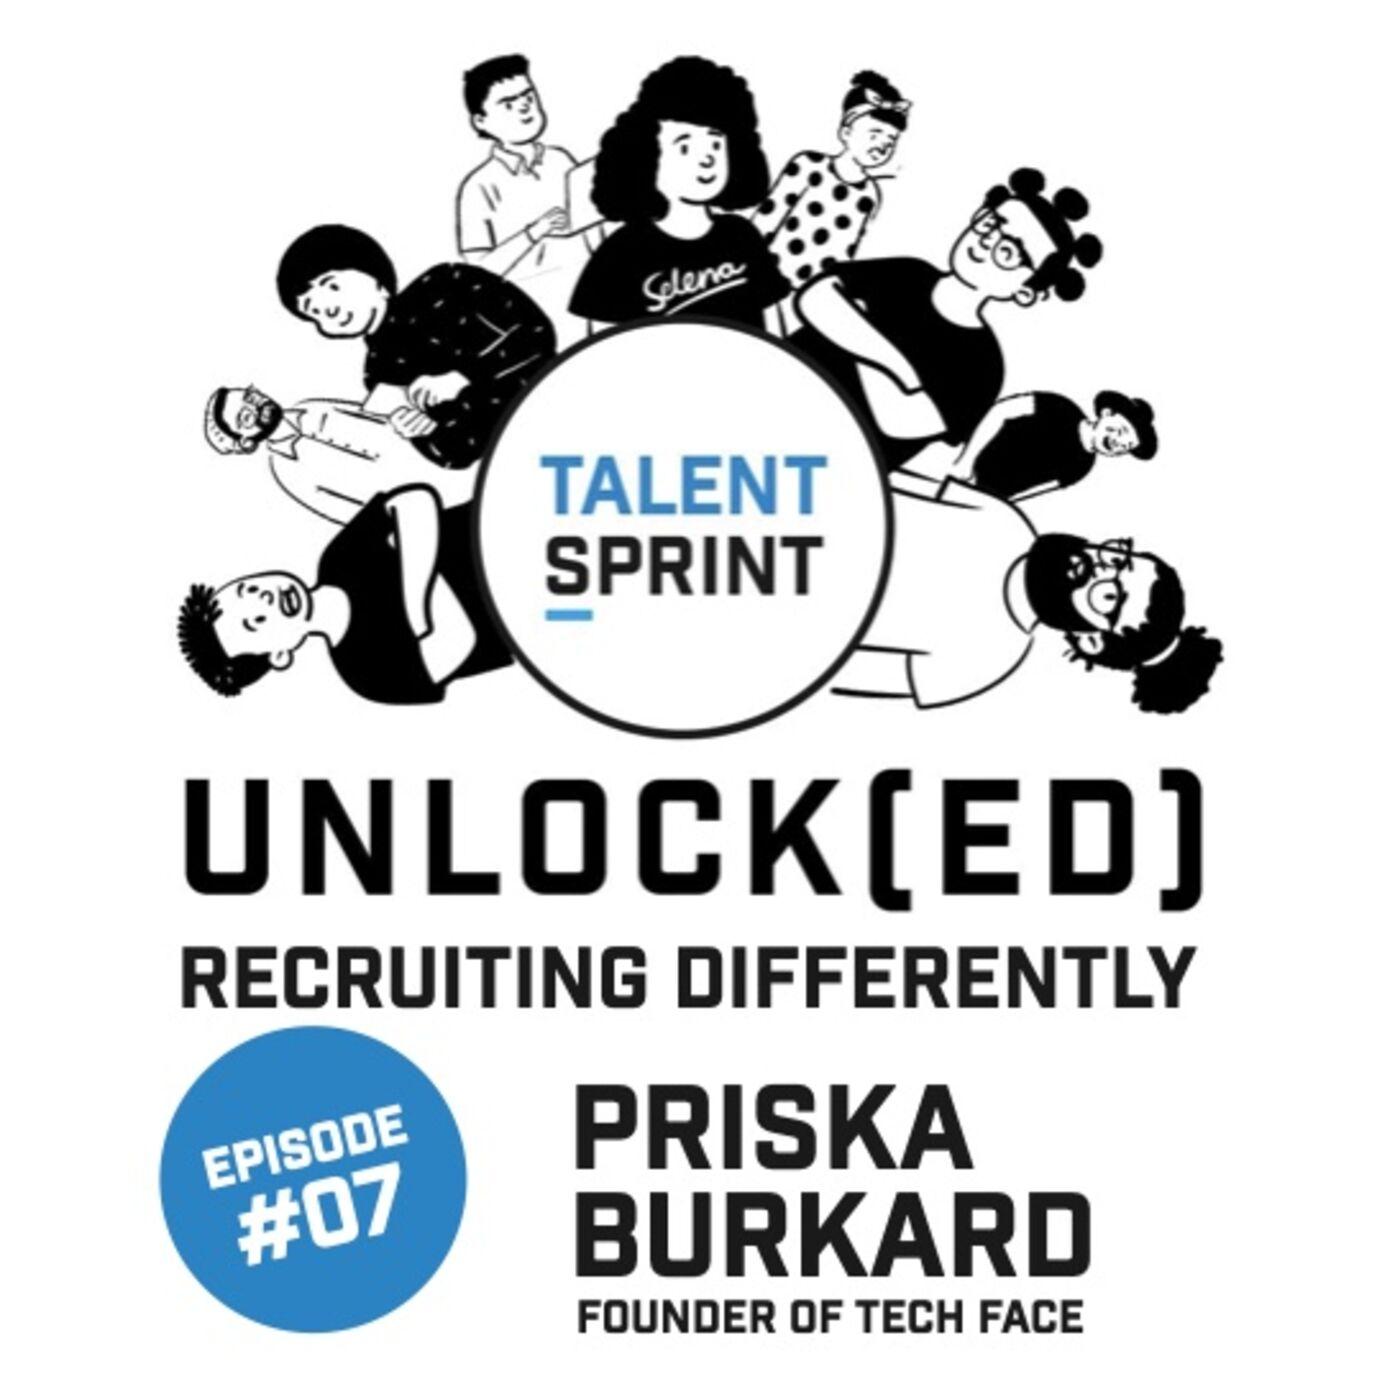 Episode 7 - Unlock(ed) Priska Burkard (co-founder TechFace)